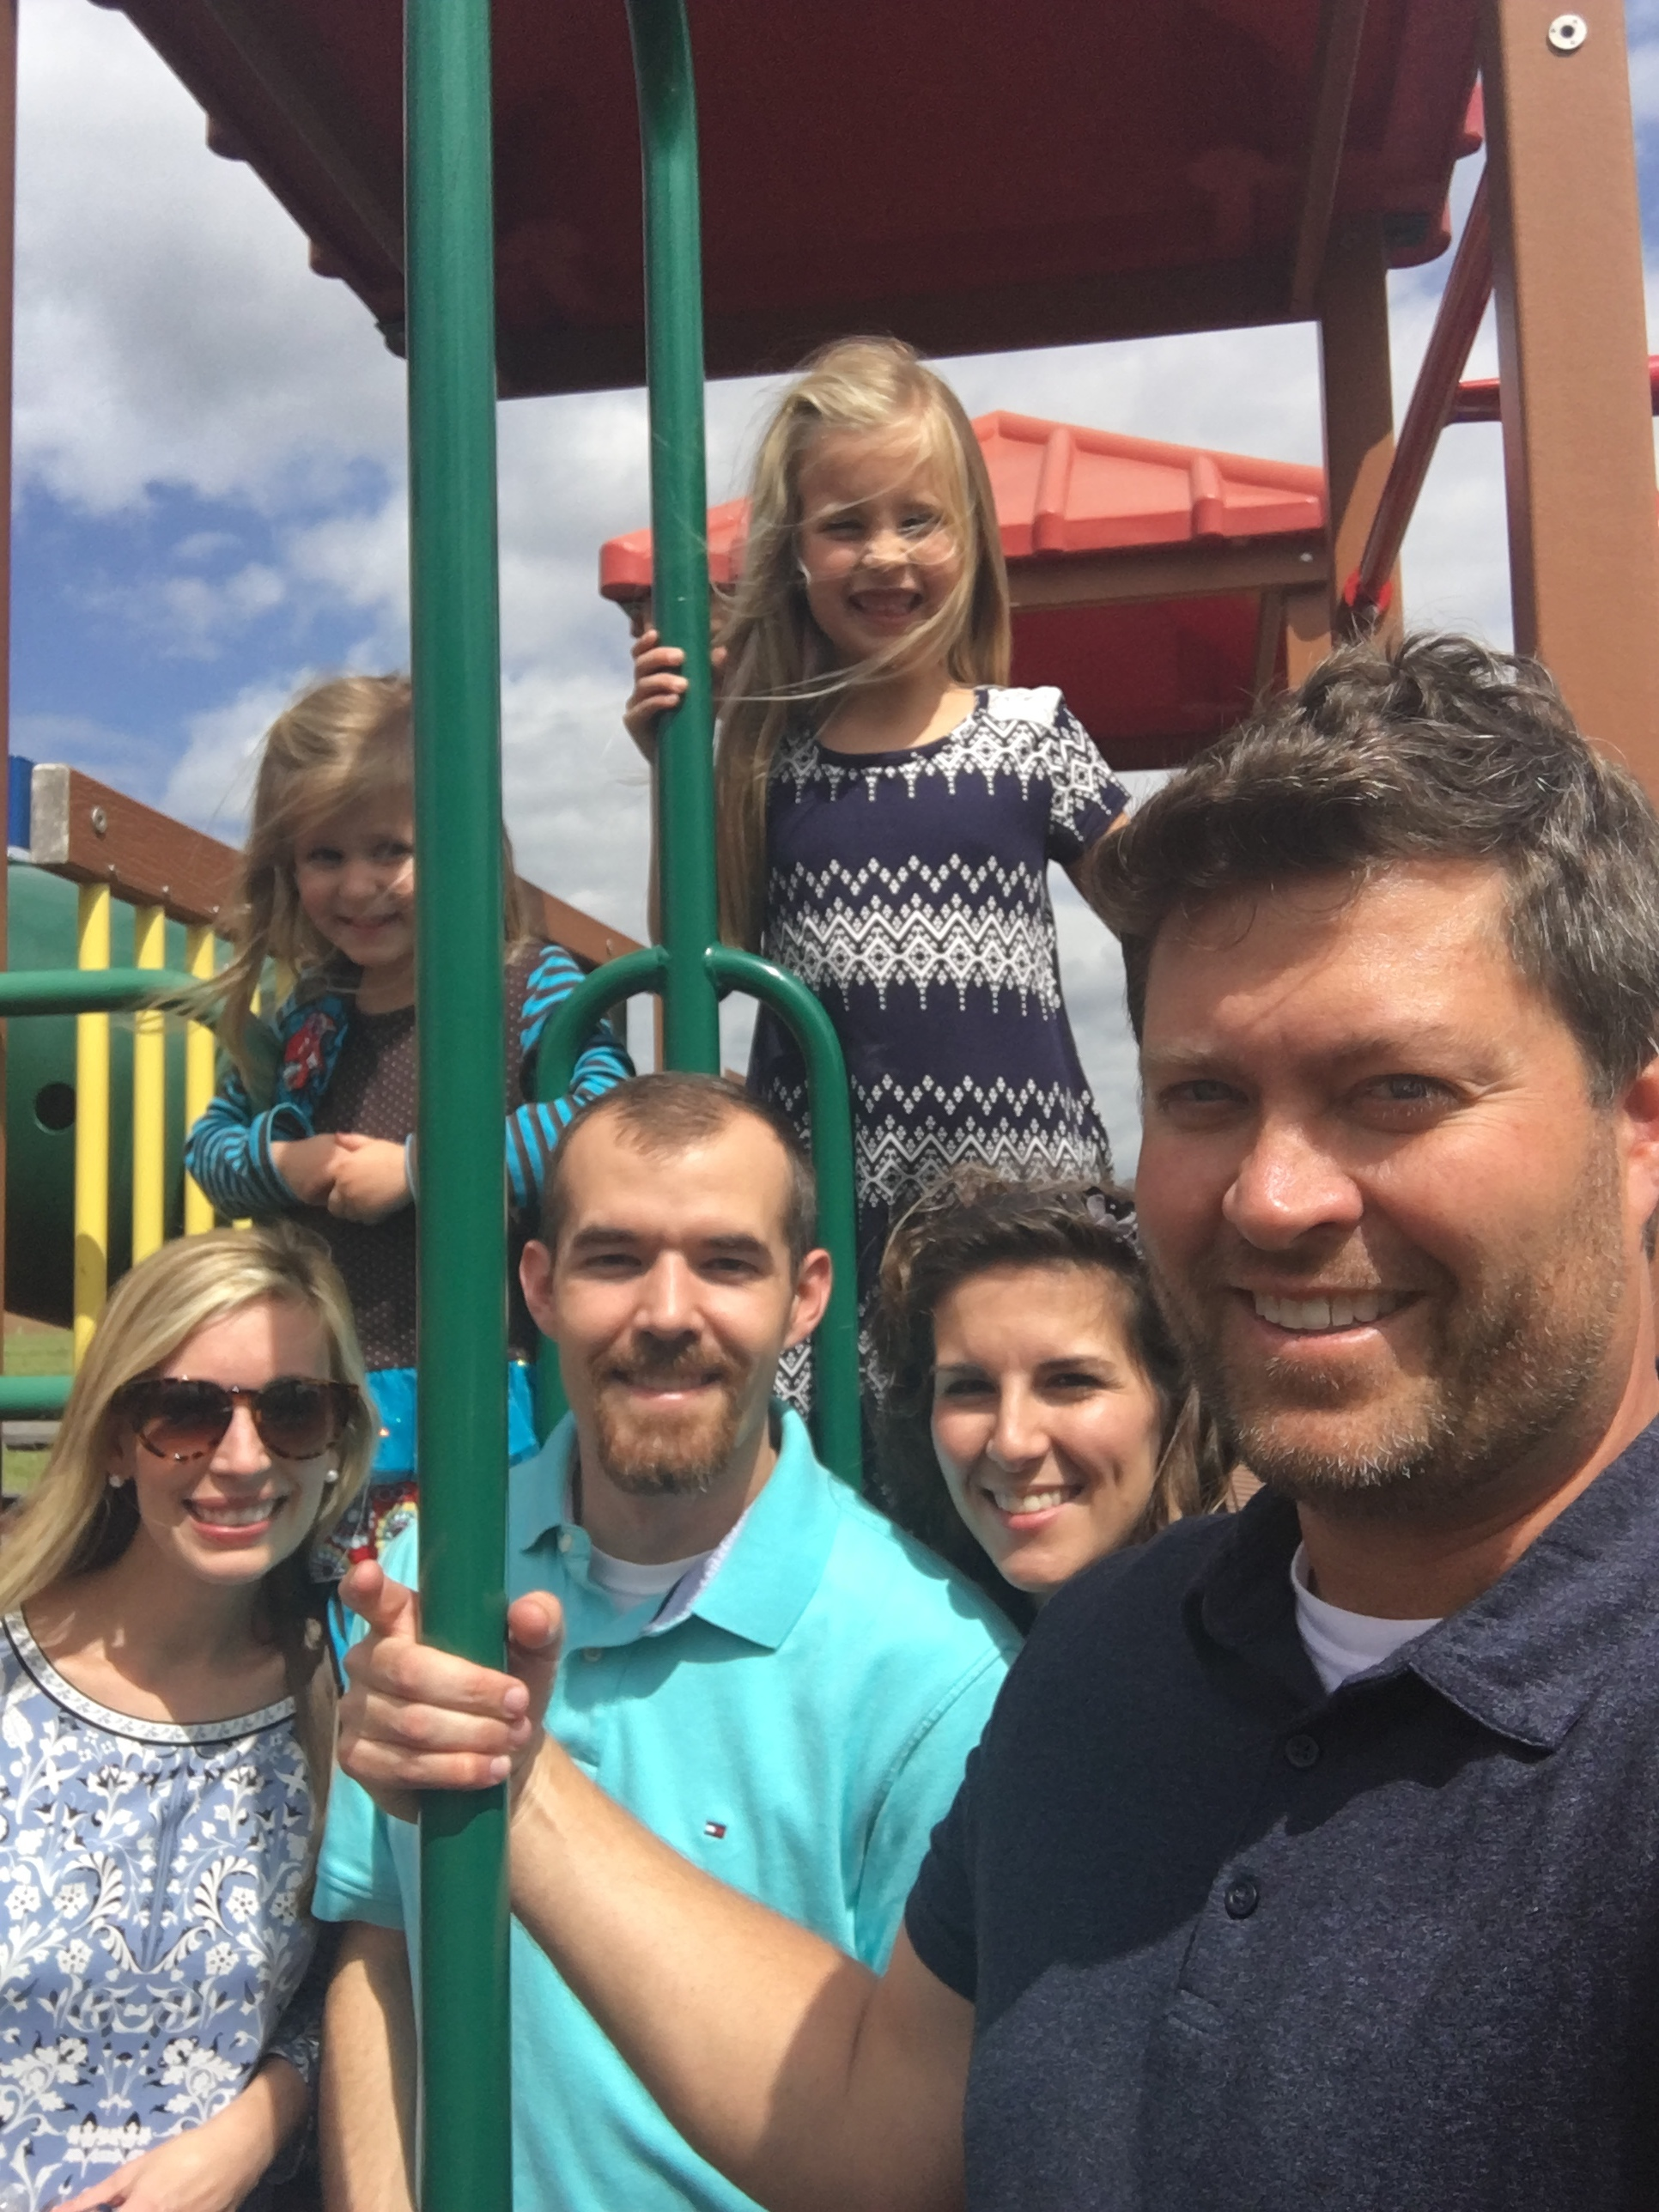 Missions Sunday in North Carolina